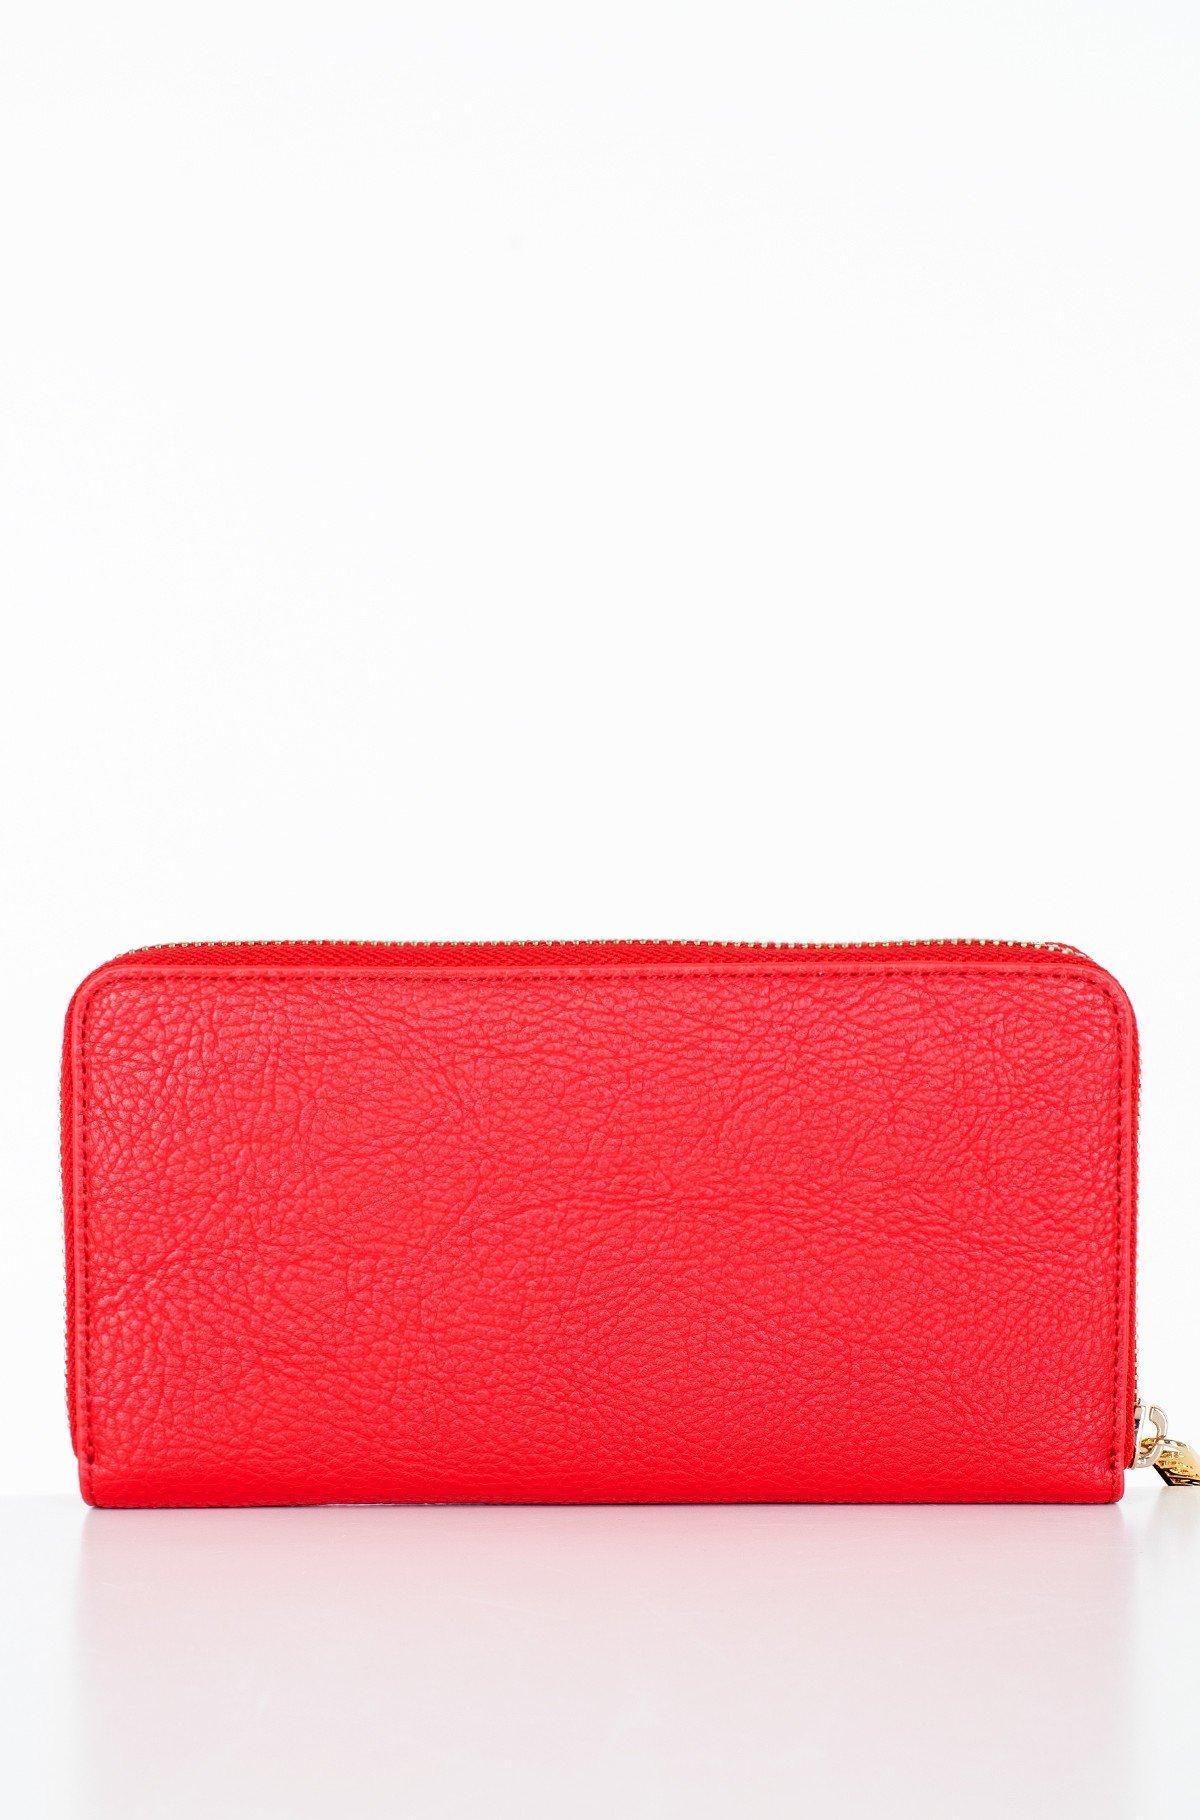 Wallet TH CORE LARGE ZA-full-2